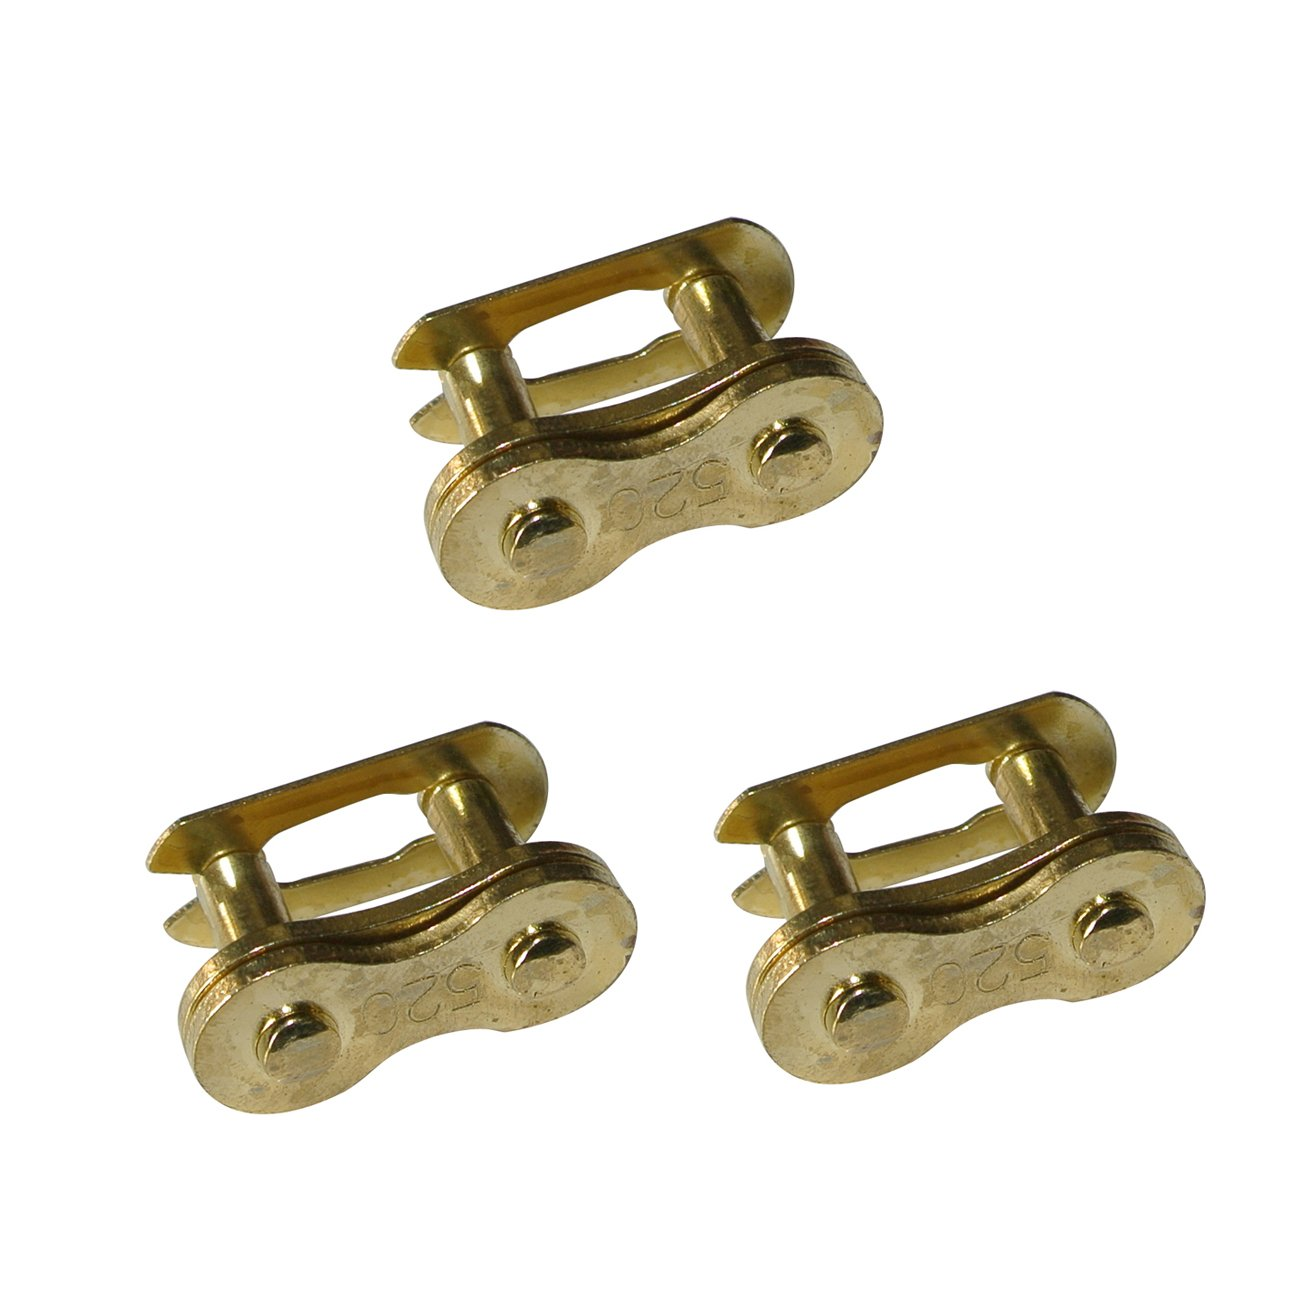 JRL 3pcs Gold 520 Chain Master Link Fit Suzuki Rm125 250 450 Drz400 ATV Quad Go Kart